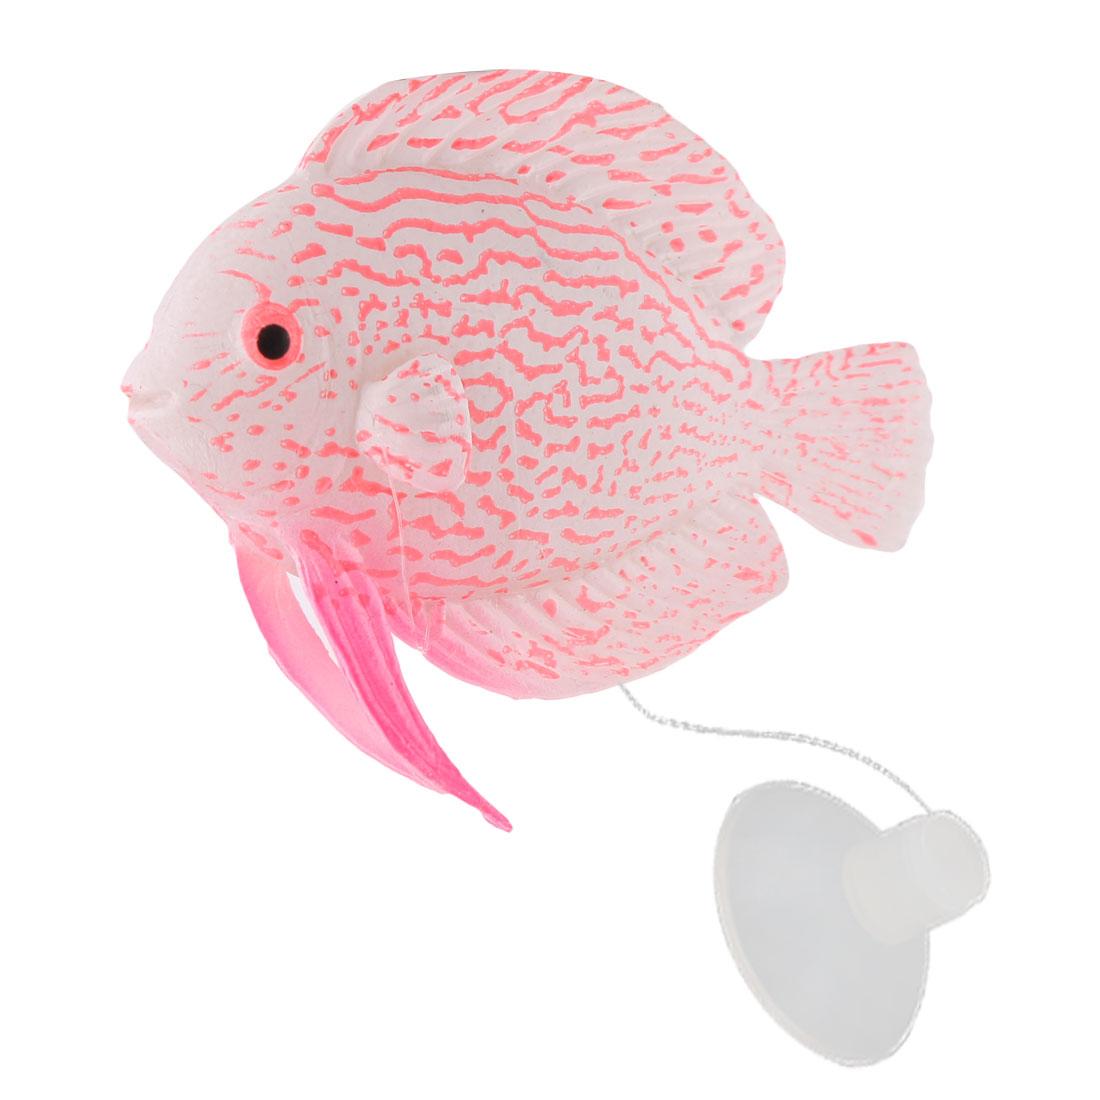 Aquarium Fish Tank Suction Cup Artificial Tropical Fish Decor Decoration Pink